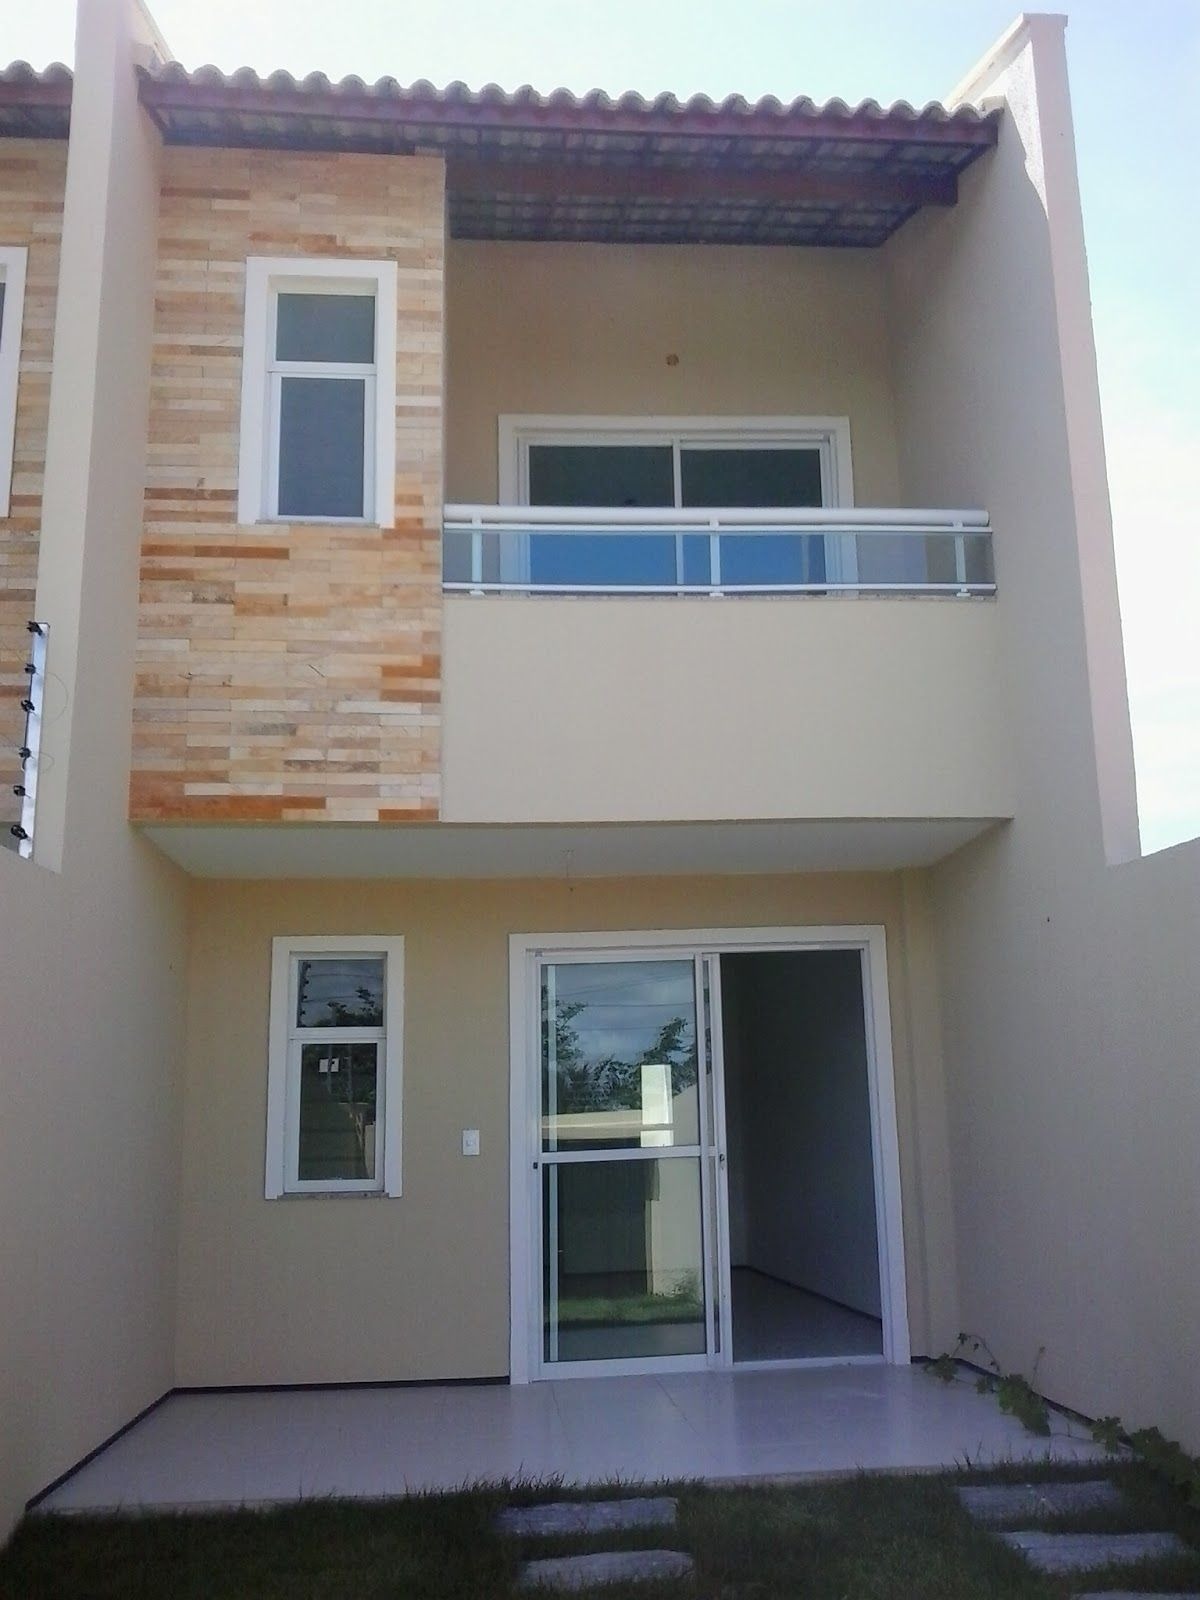 Fachadas de casas duplex pequenas 1 ideias para a casa for Casas pequenas con fachadas bonitas